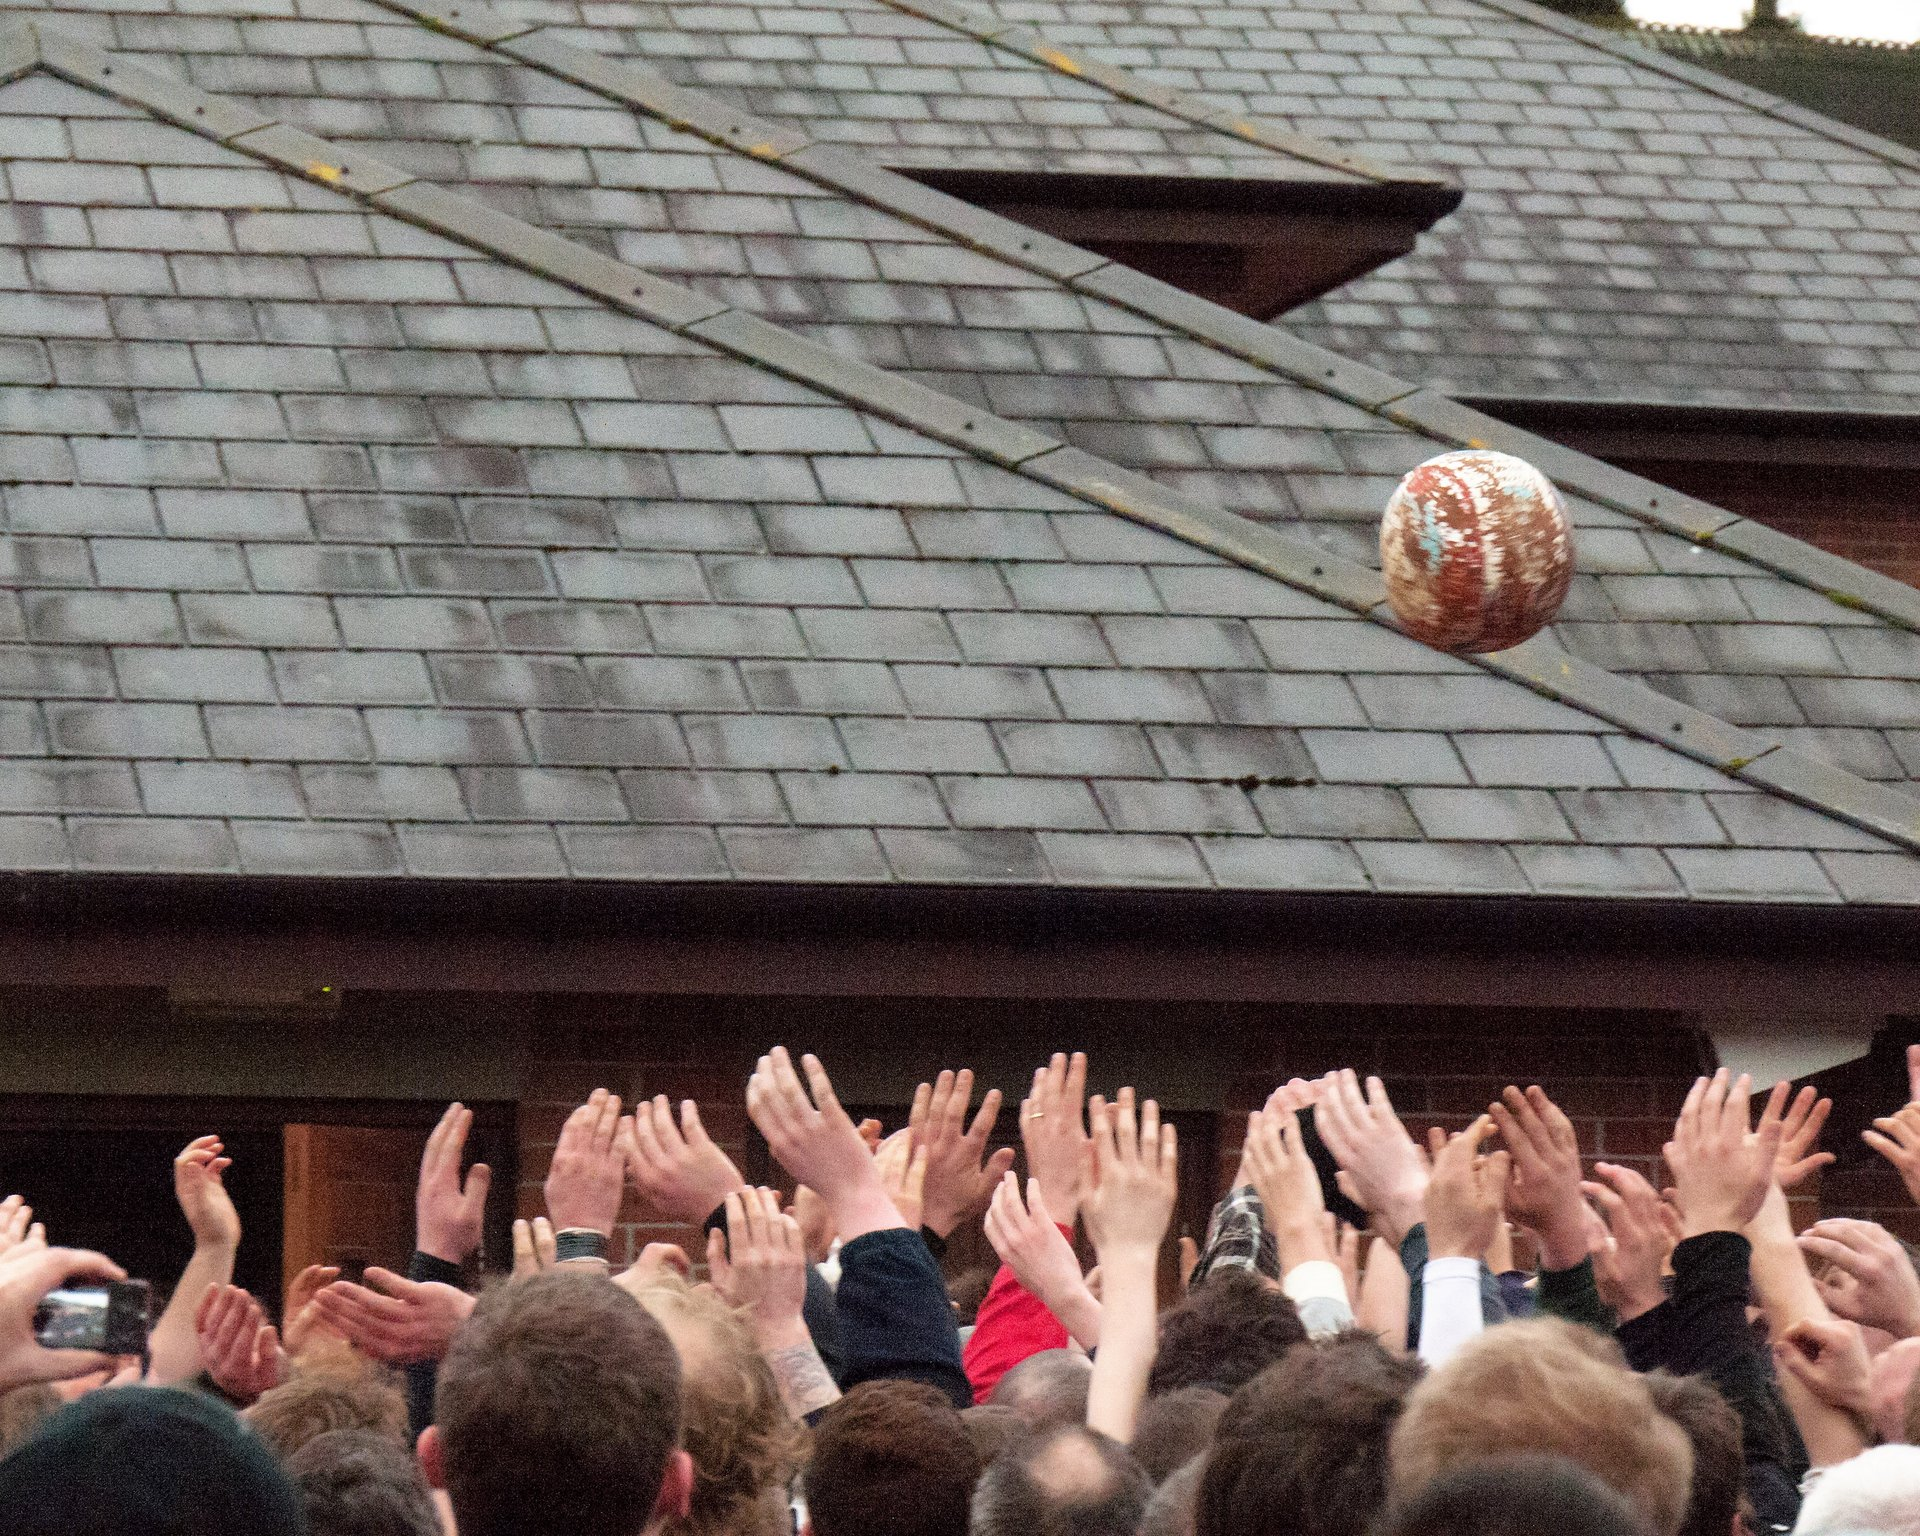 Royal Shrovetide Football  in England 2019 - Best Time